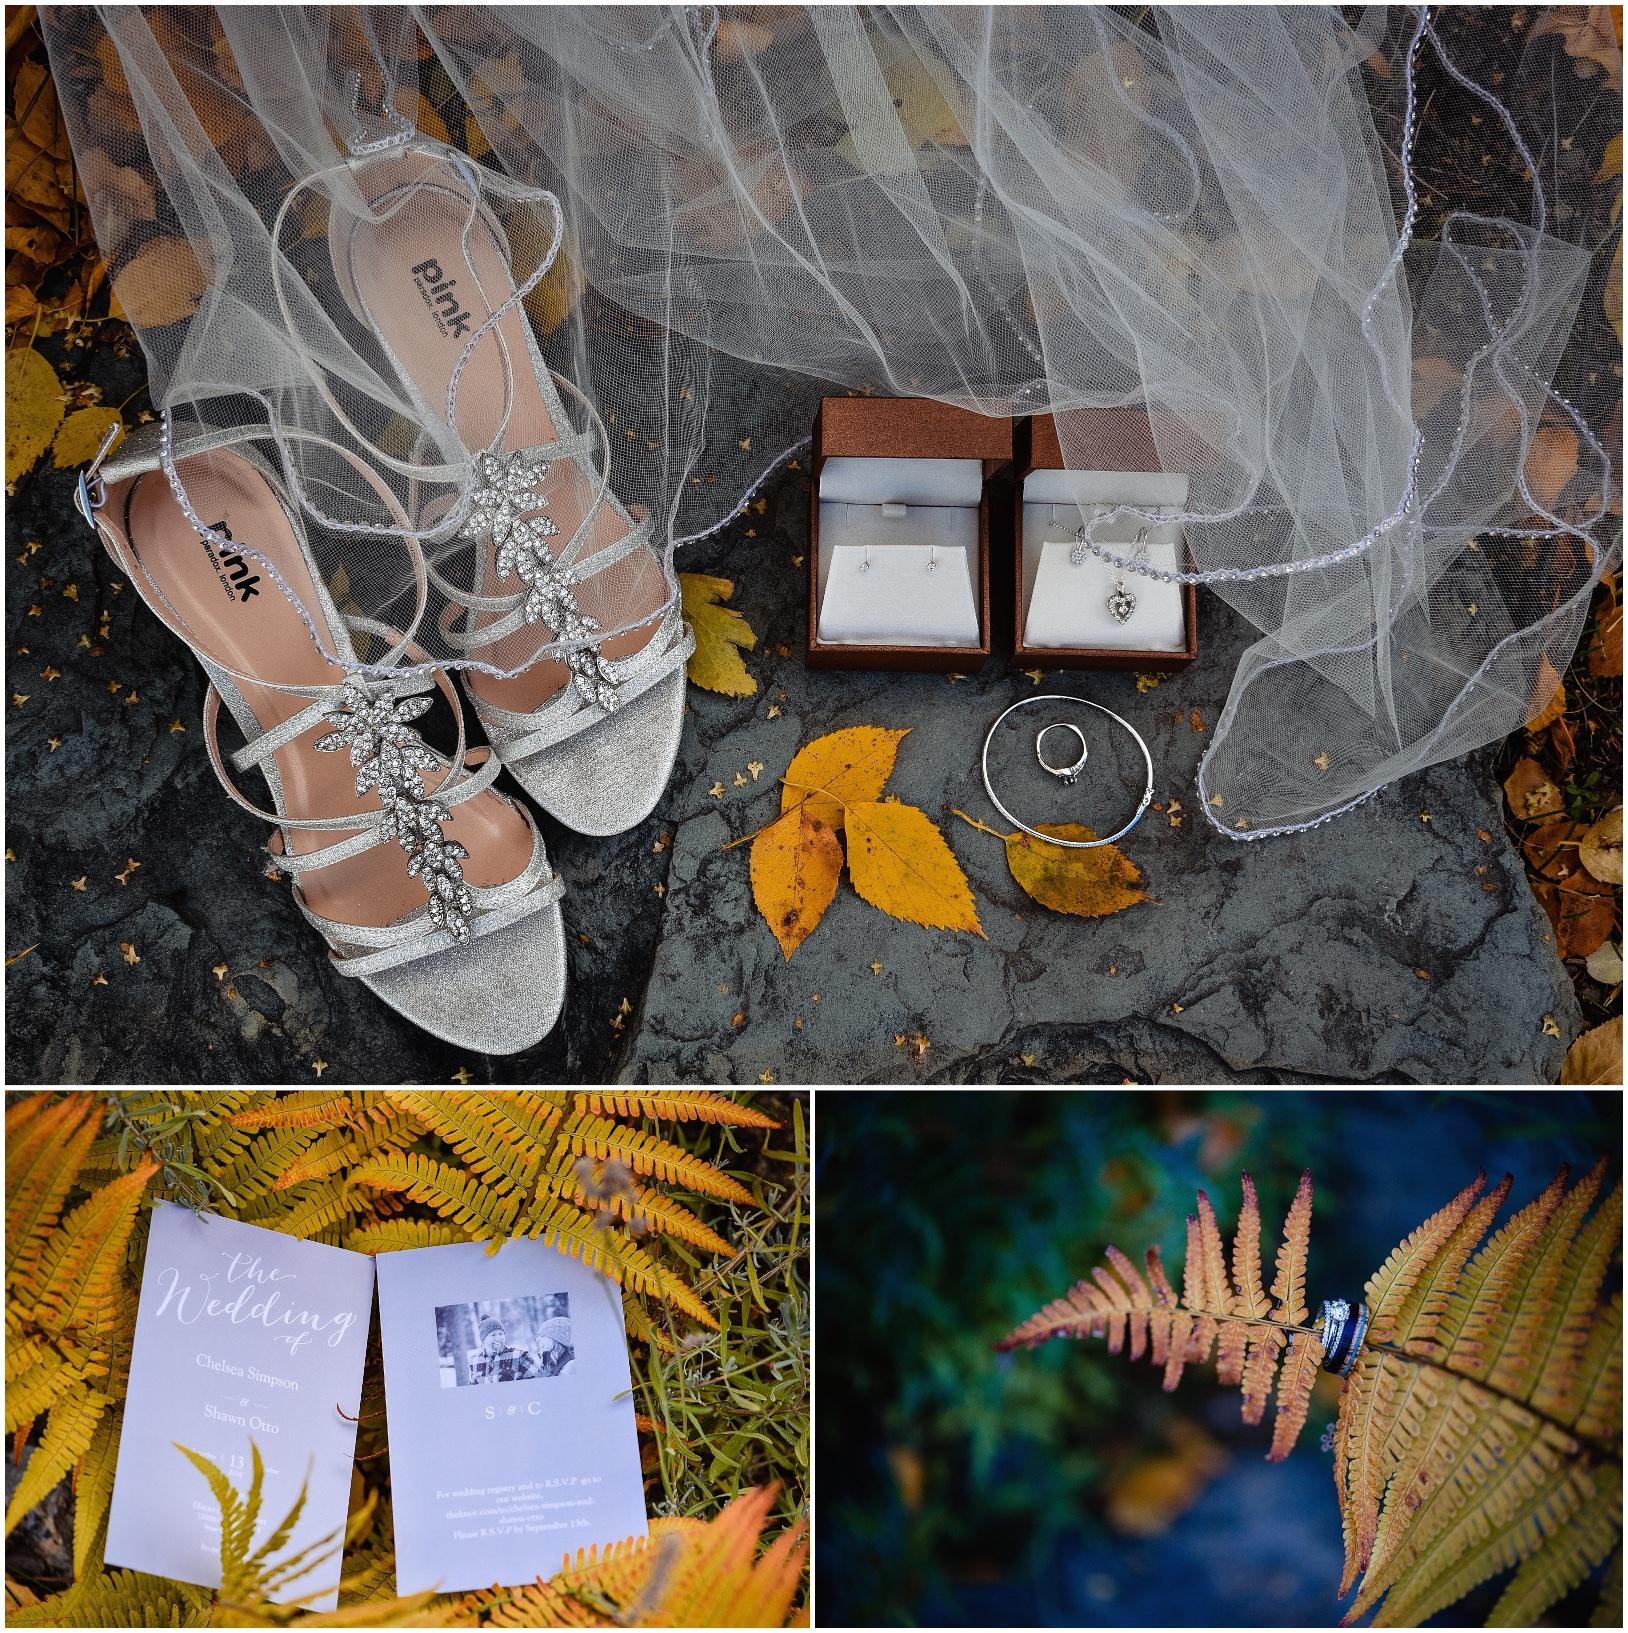 lindseyjane_wedding076.jpg